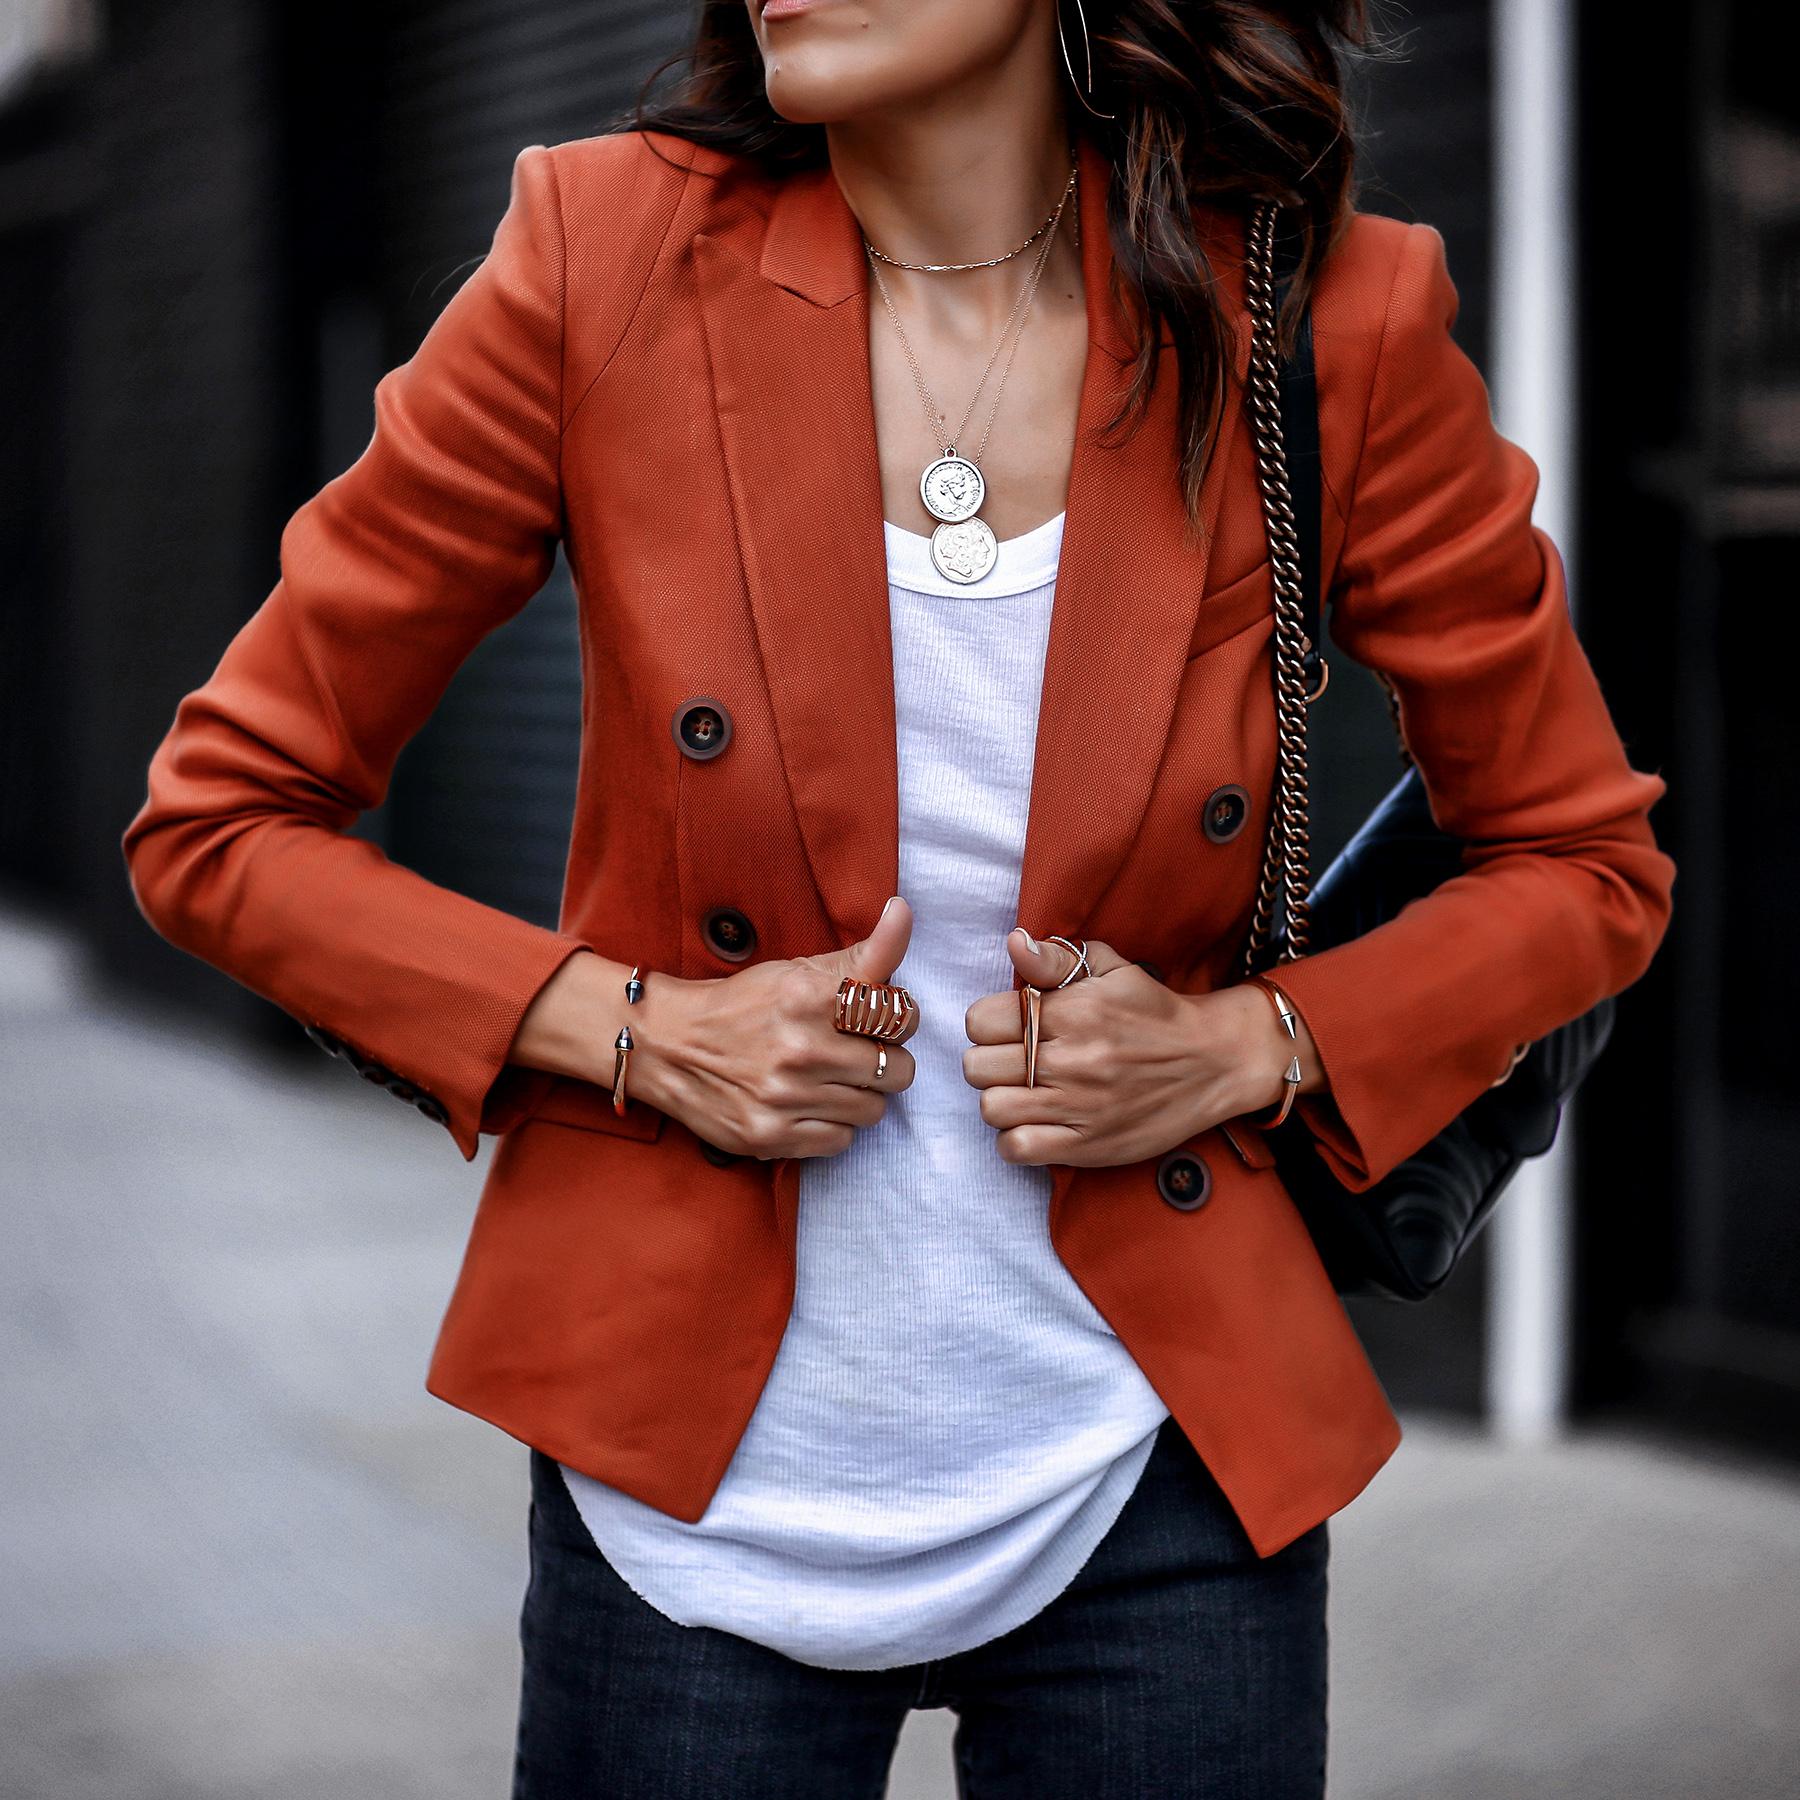 Veronica Beard Blazer Asos Jeans Latin Blogger Lucys Whims.jpg